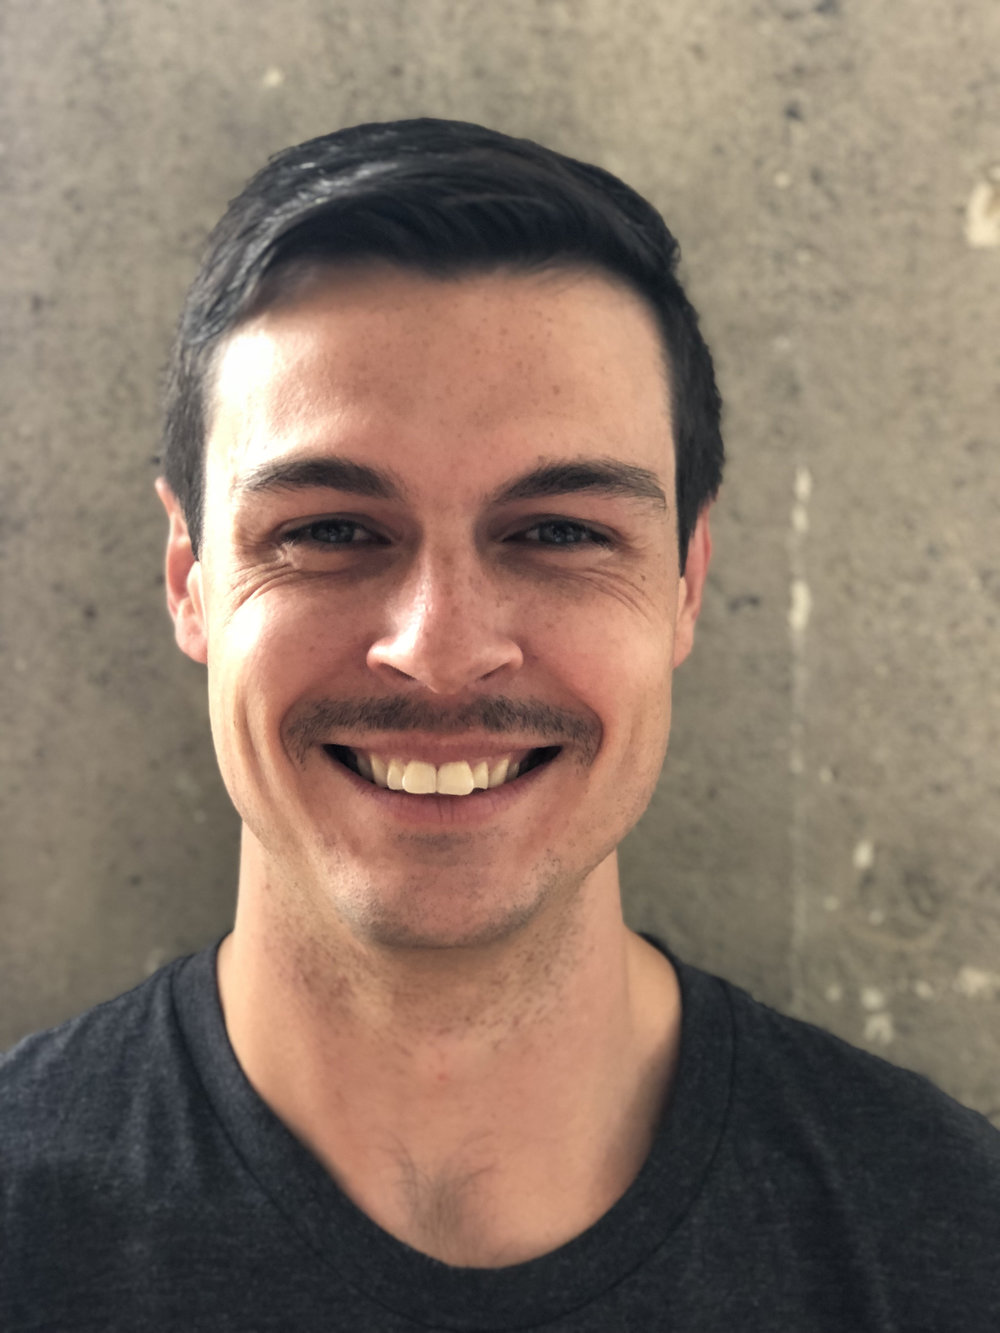 Halter's Head of Software Engineering - Jordan Hagan